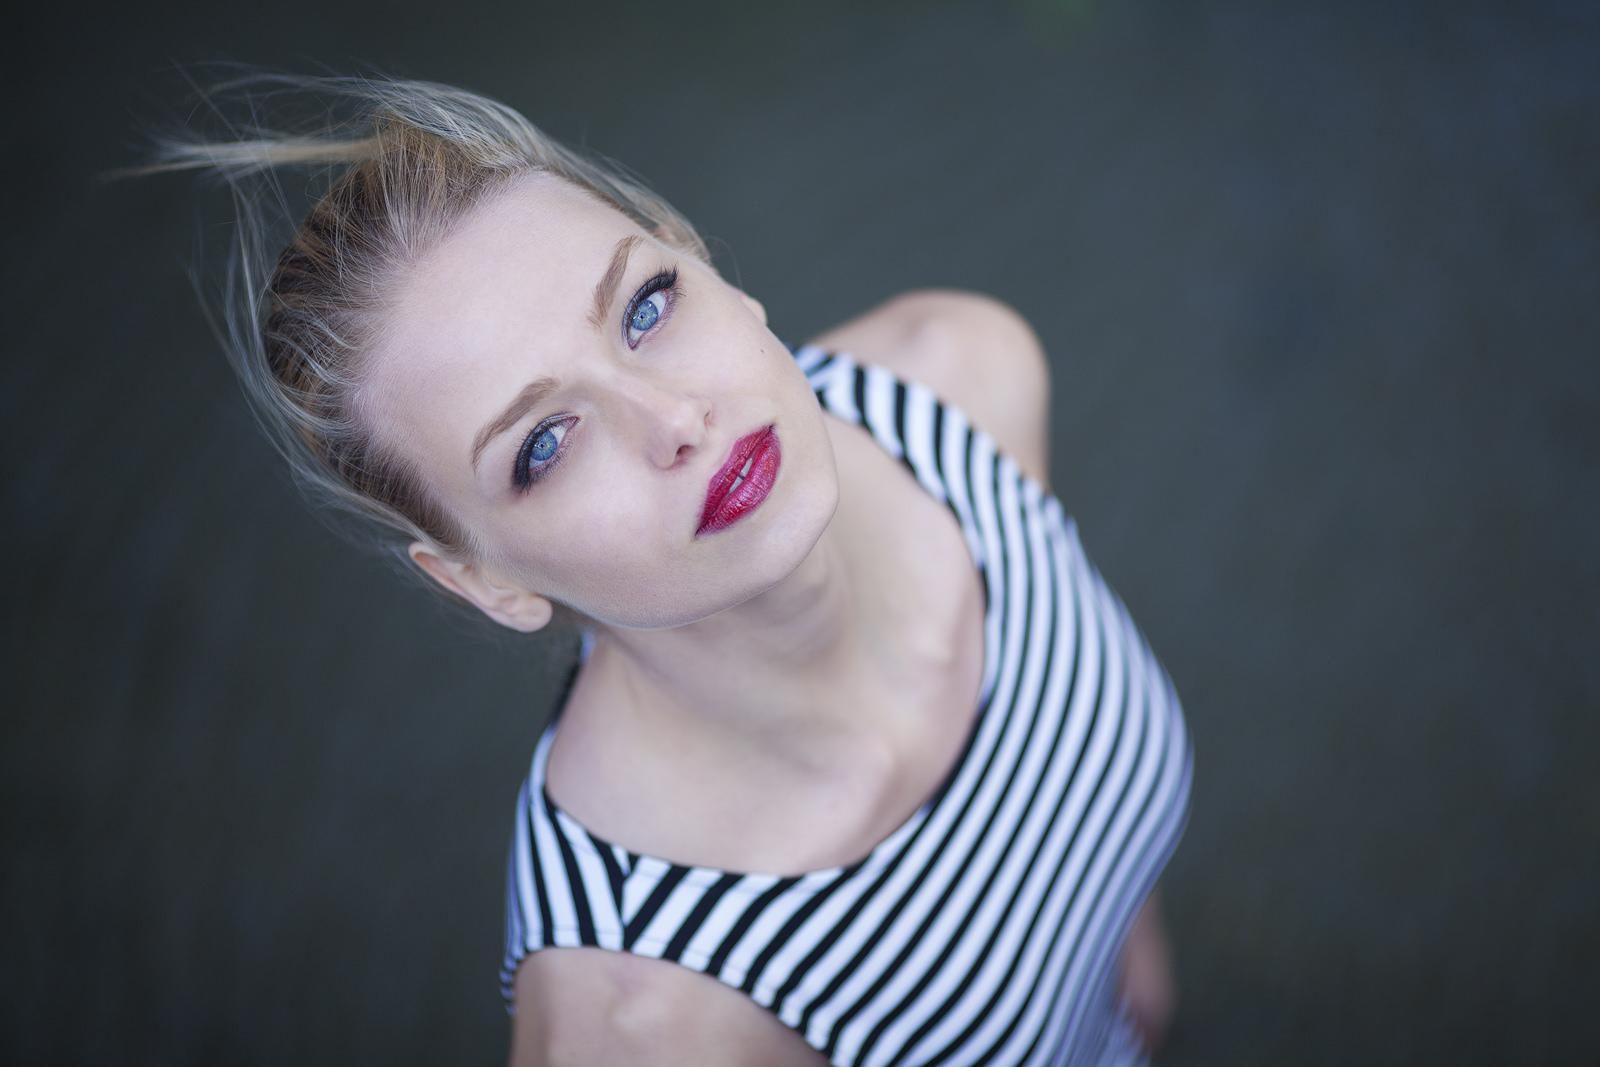 Rubia con ojos azules - 1600x1067